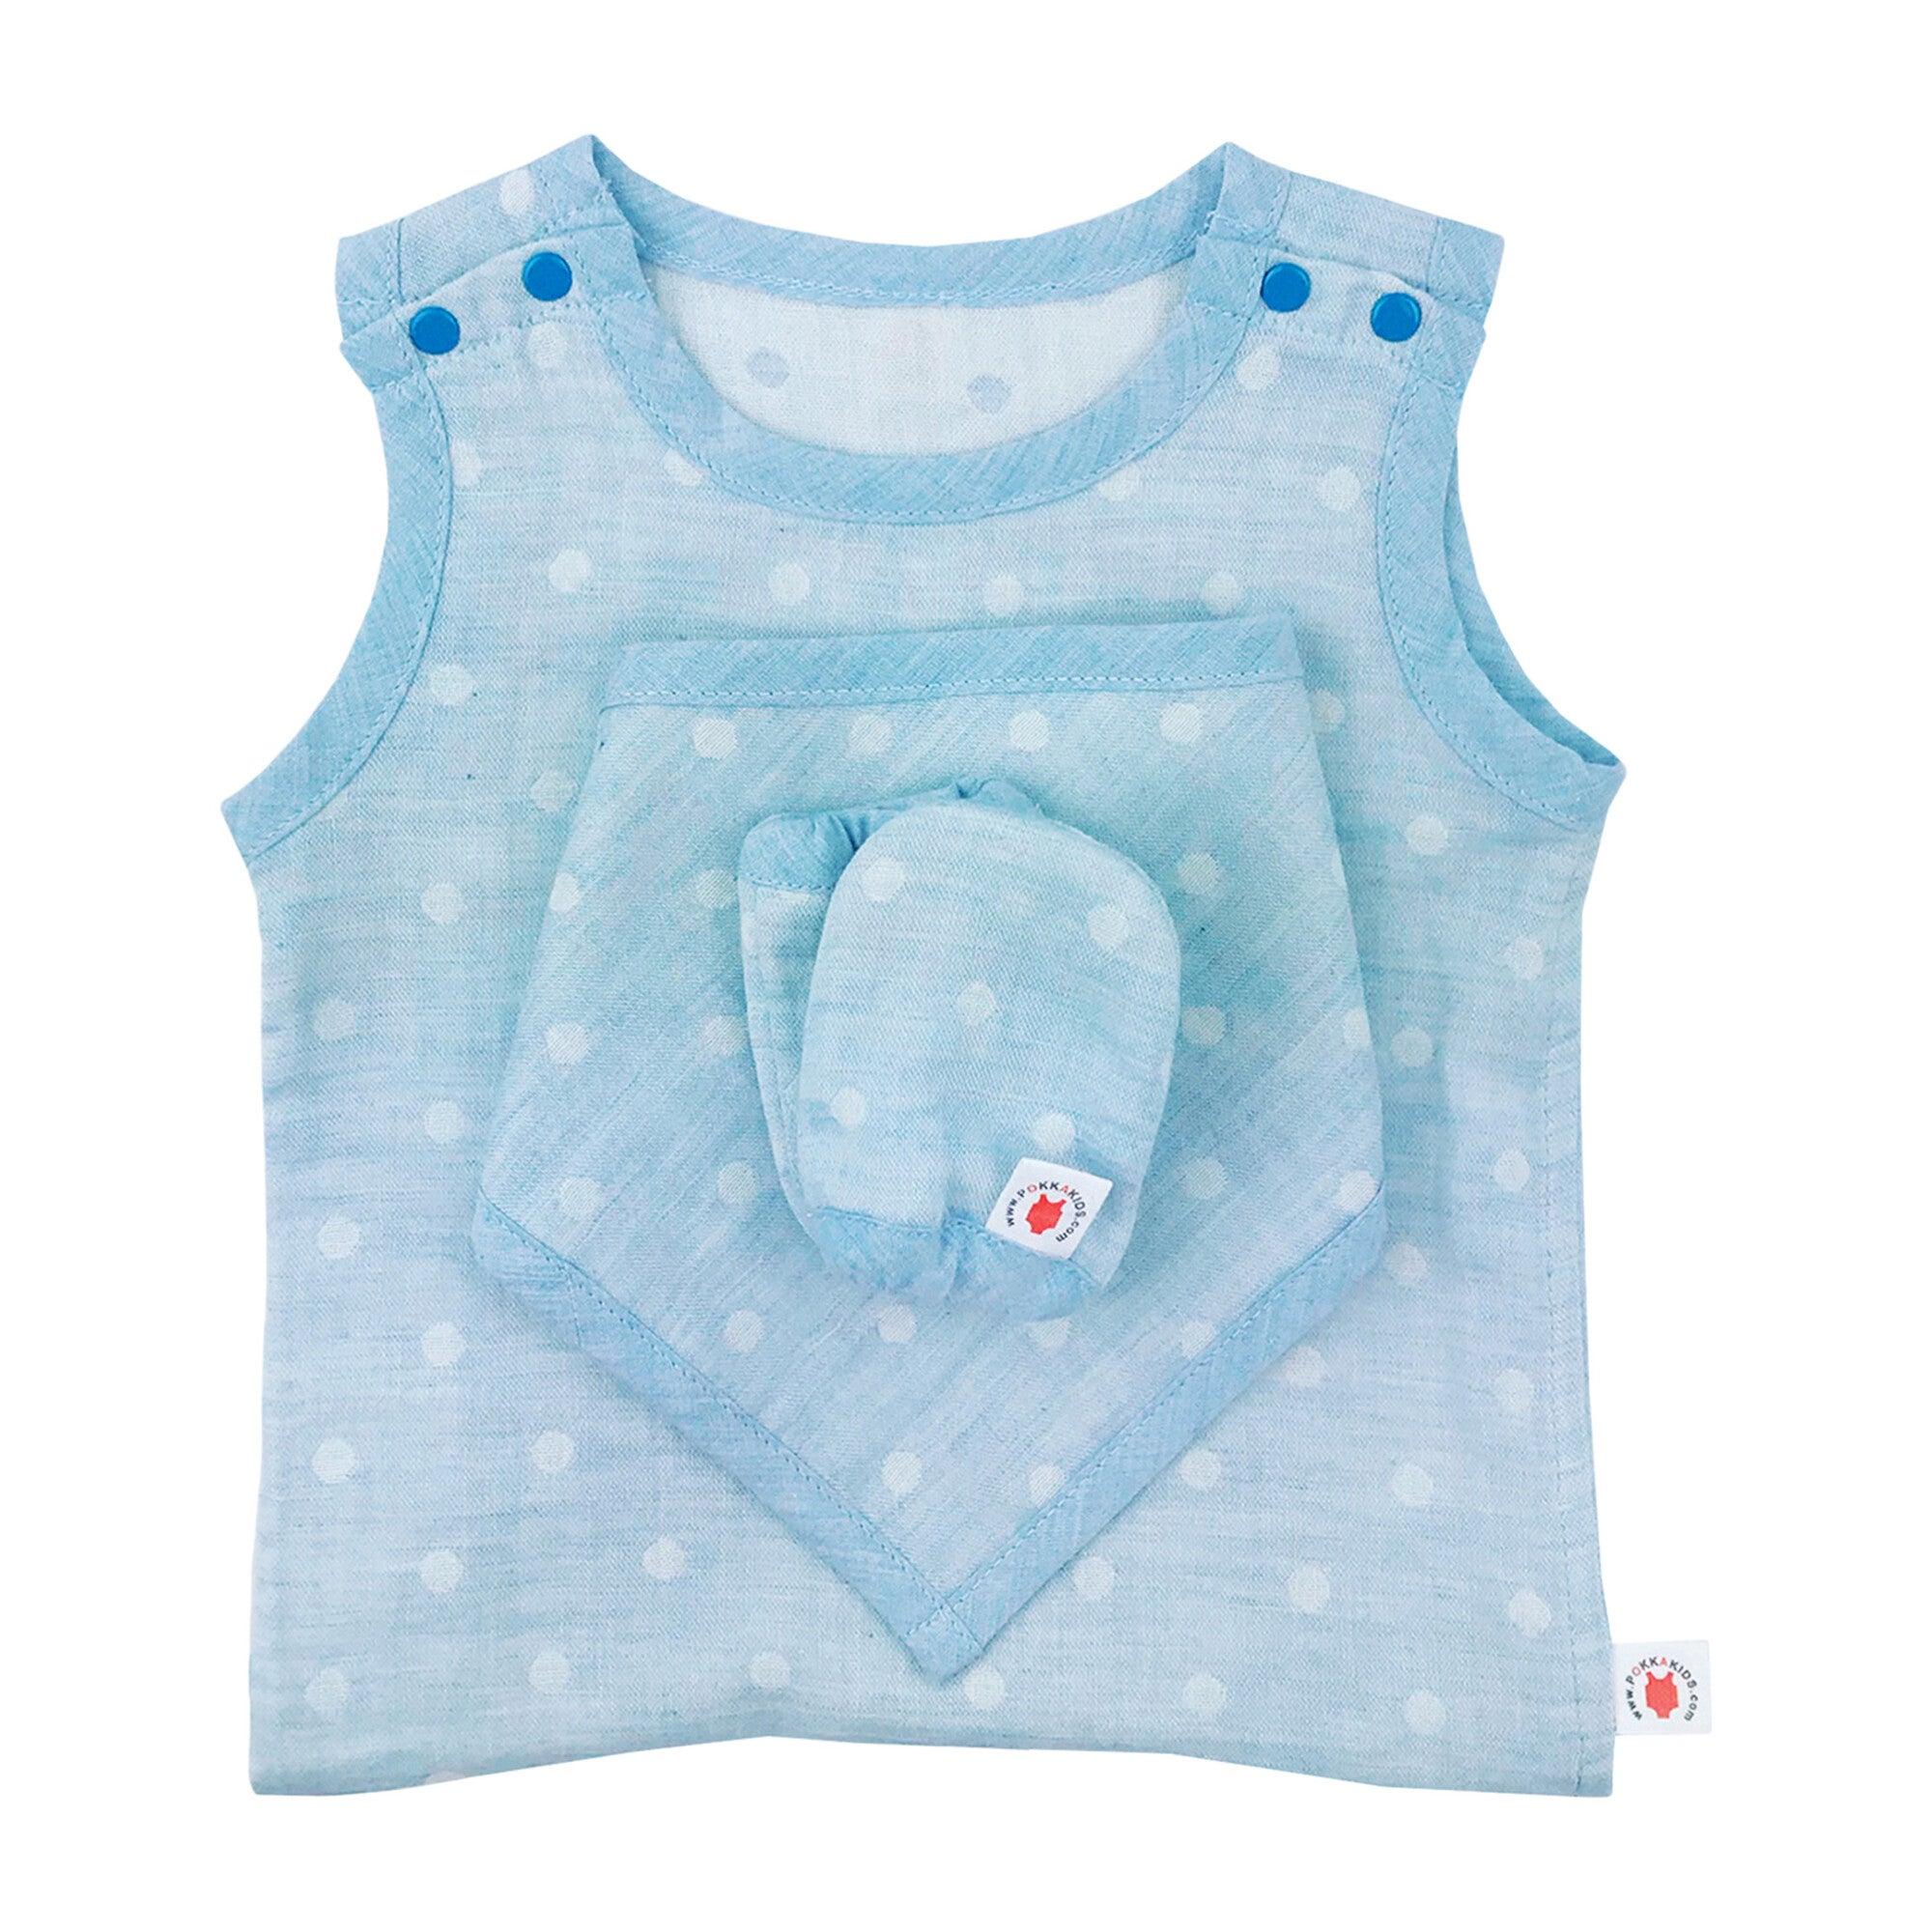 100% GOTS-Certified Organic Cotton Newborn Gift Set, Turquoise